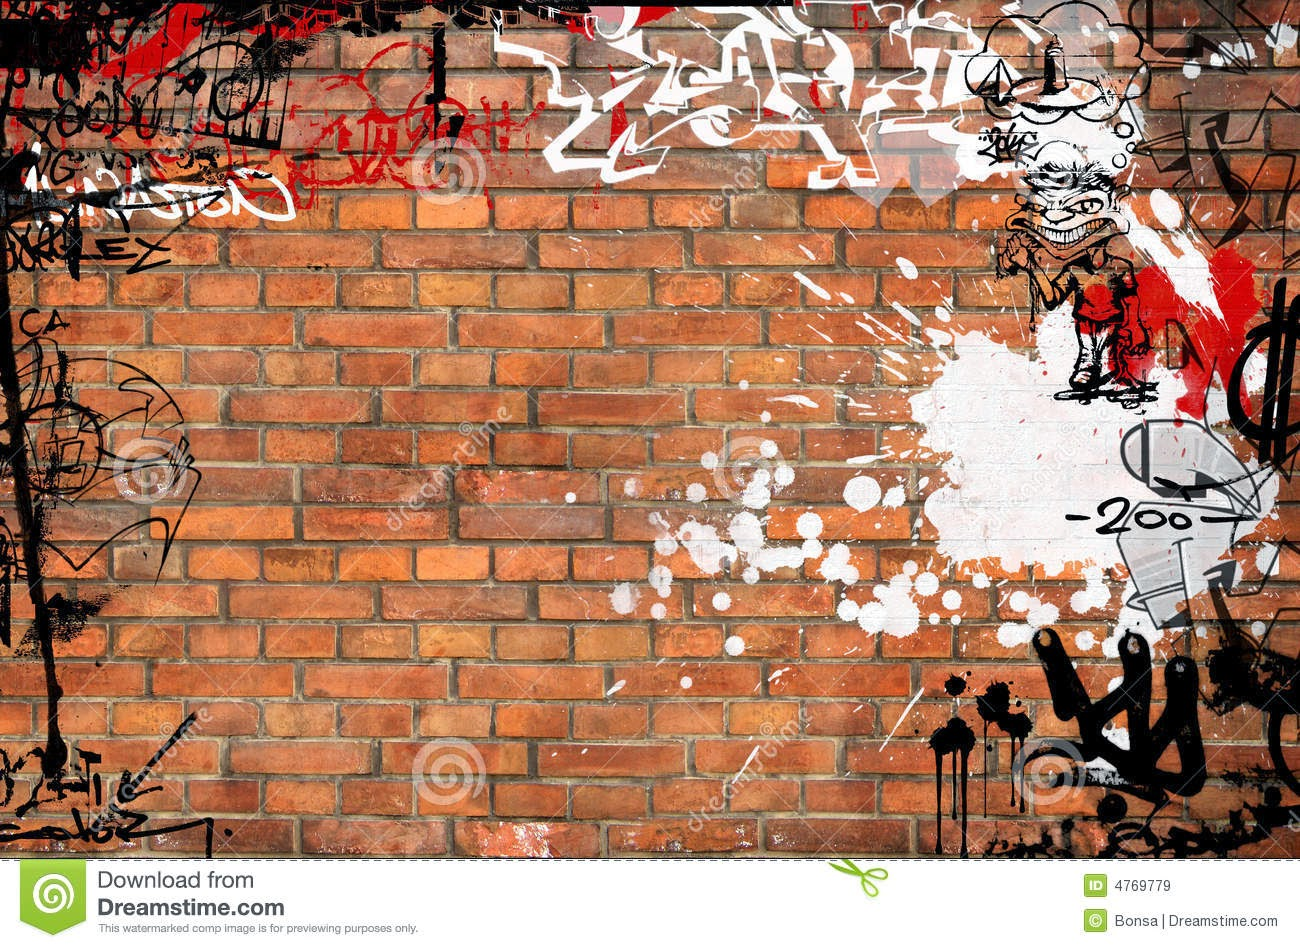 Graffiti wall pictures - Graffiti Brick Wall Drawing